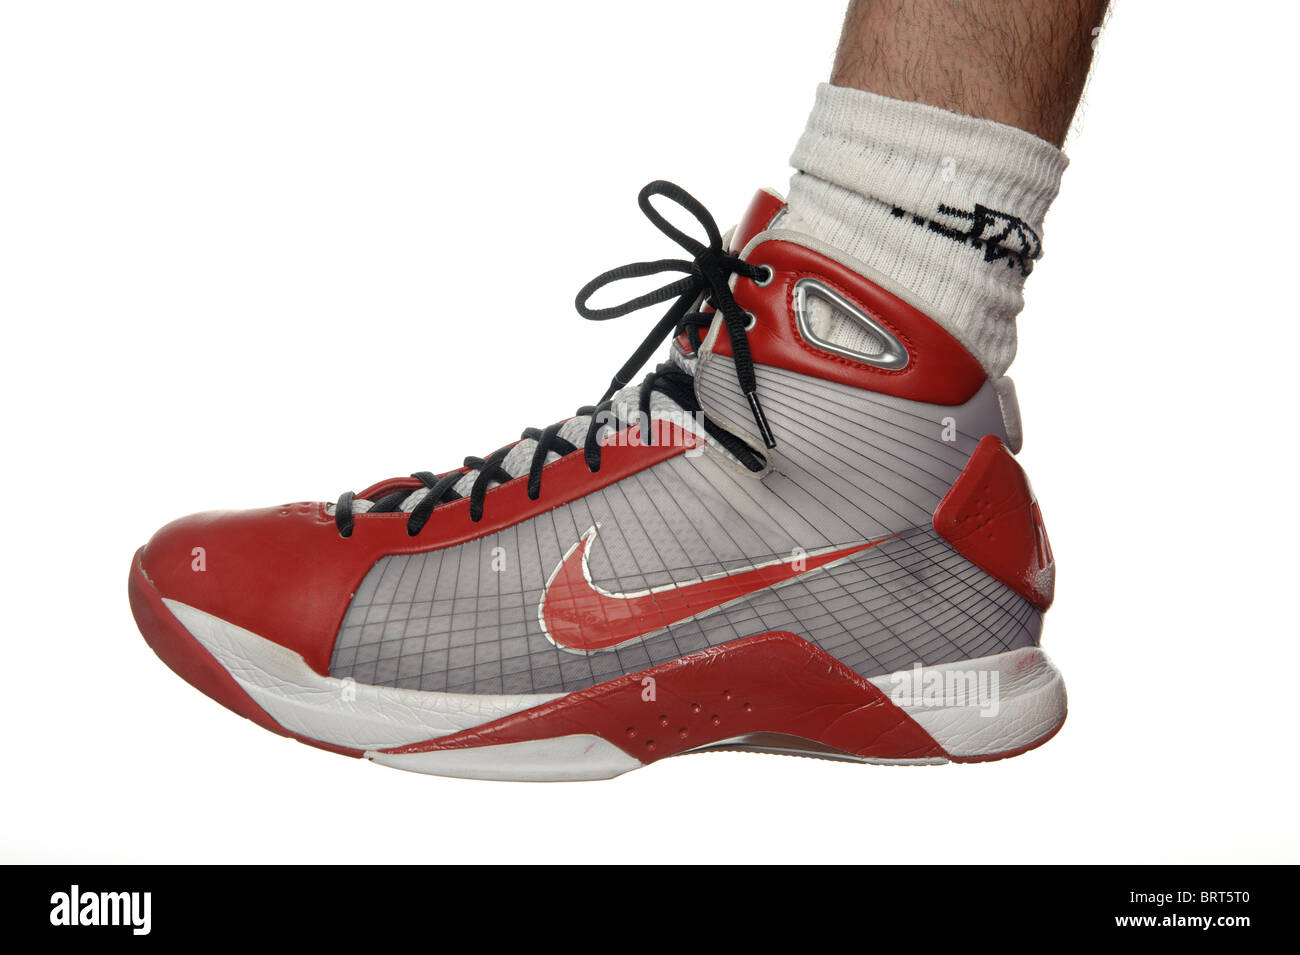 Nike basketball shoe - Stock Image